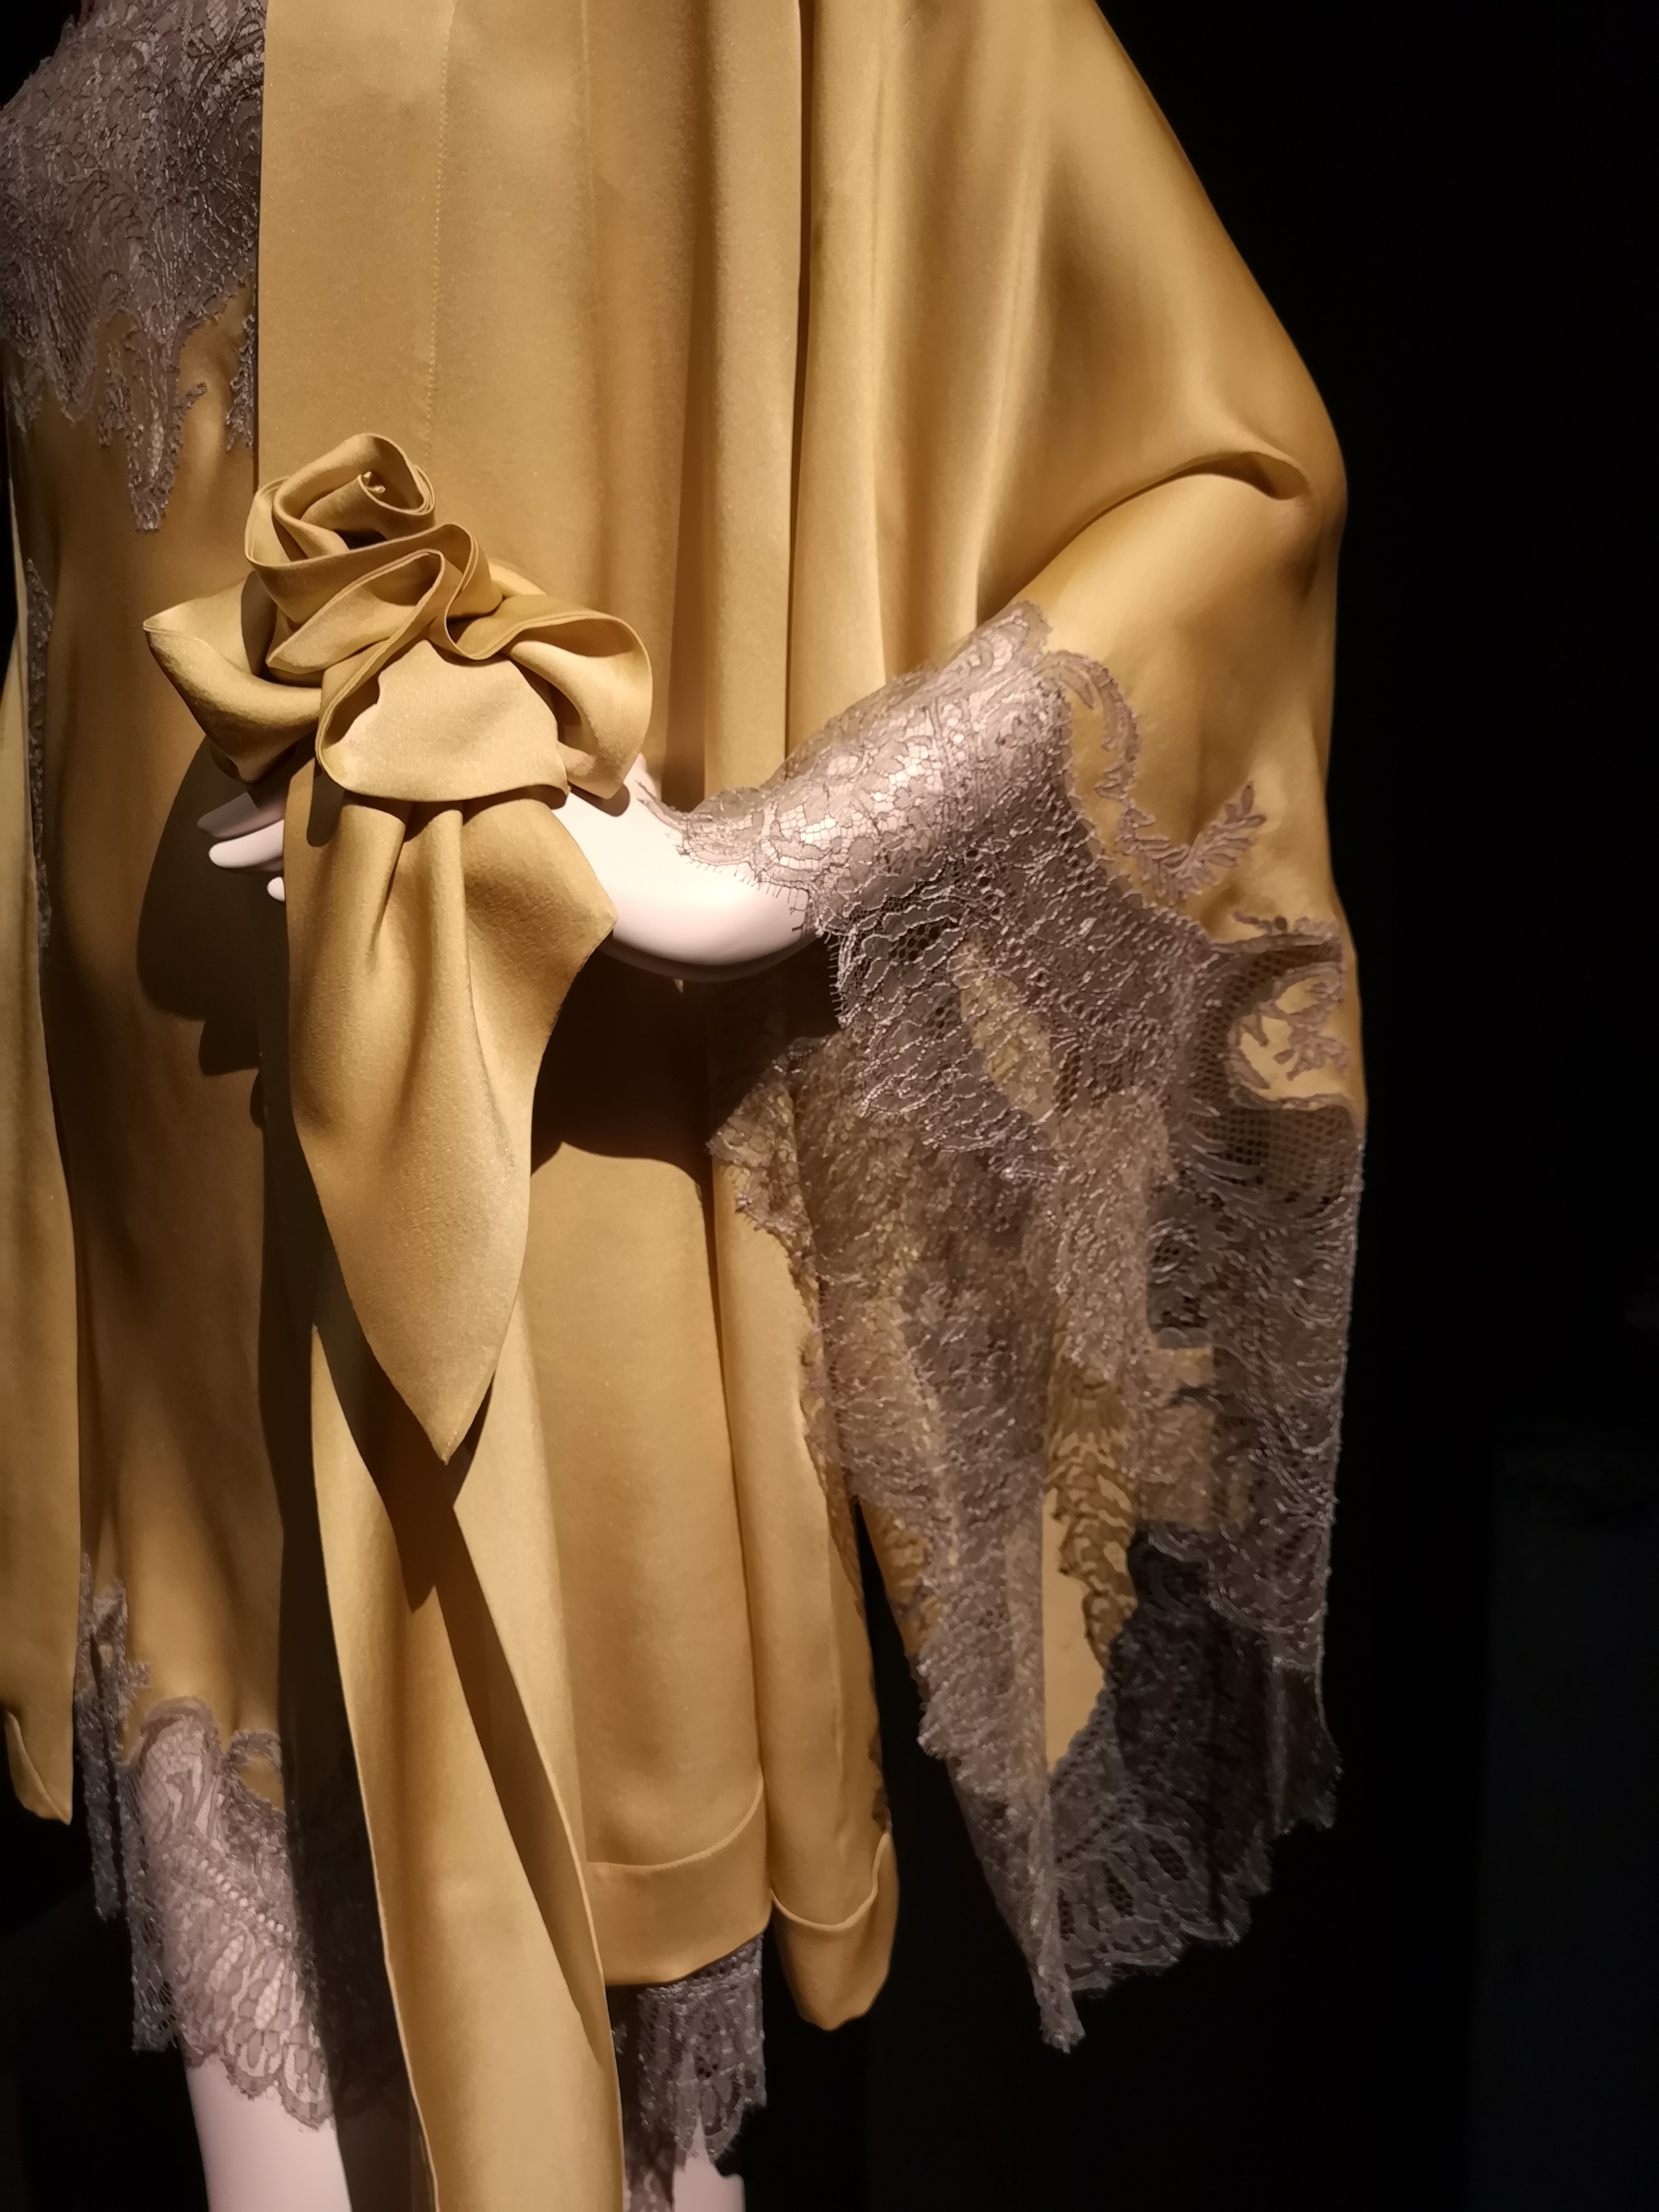 exposition-carine-gilson-bruxelles